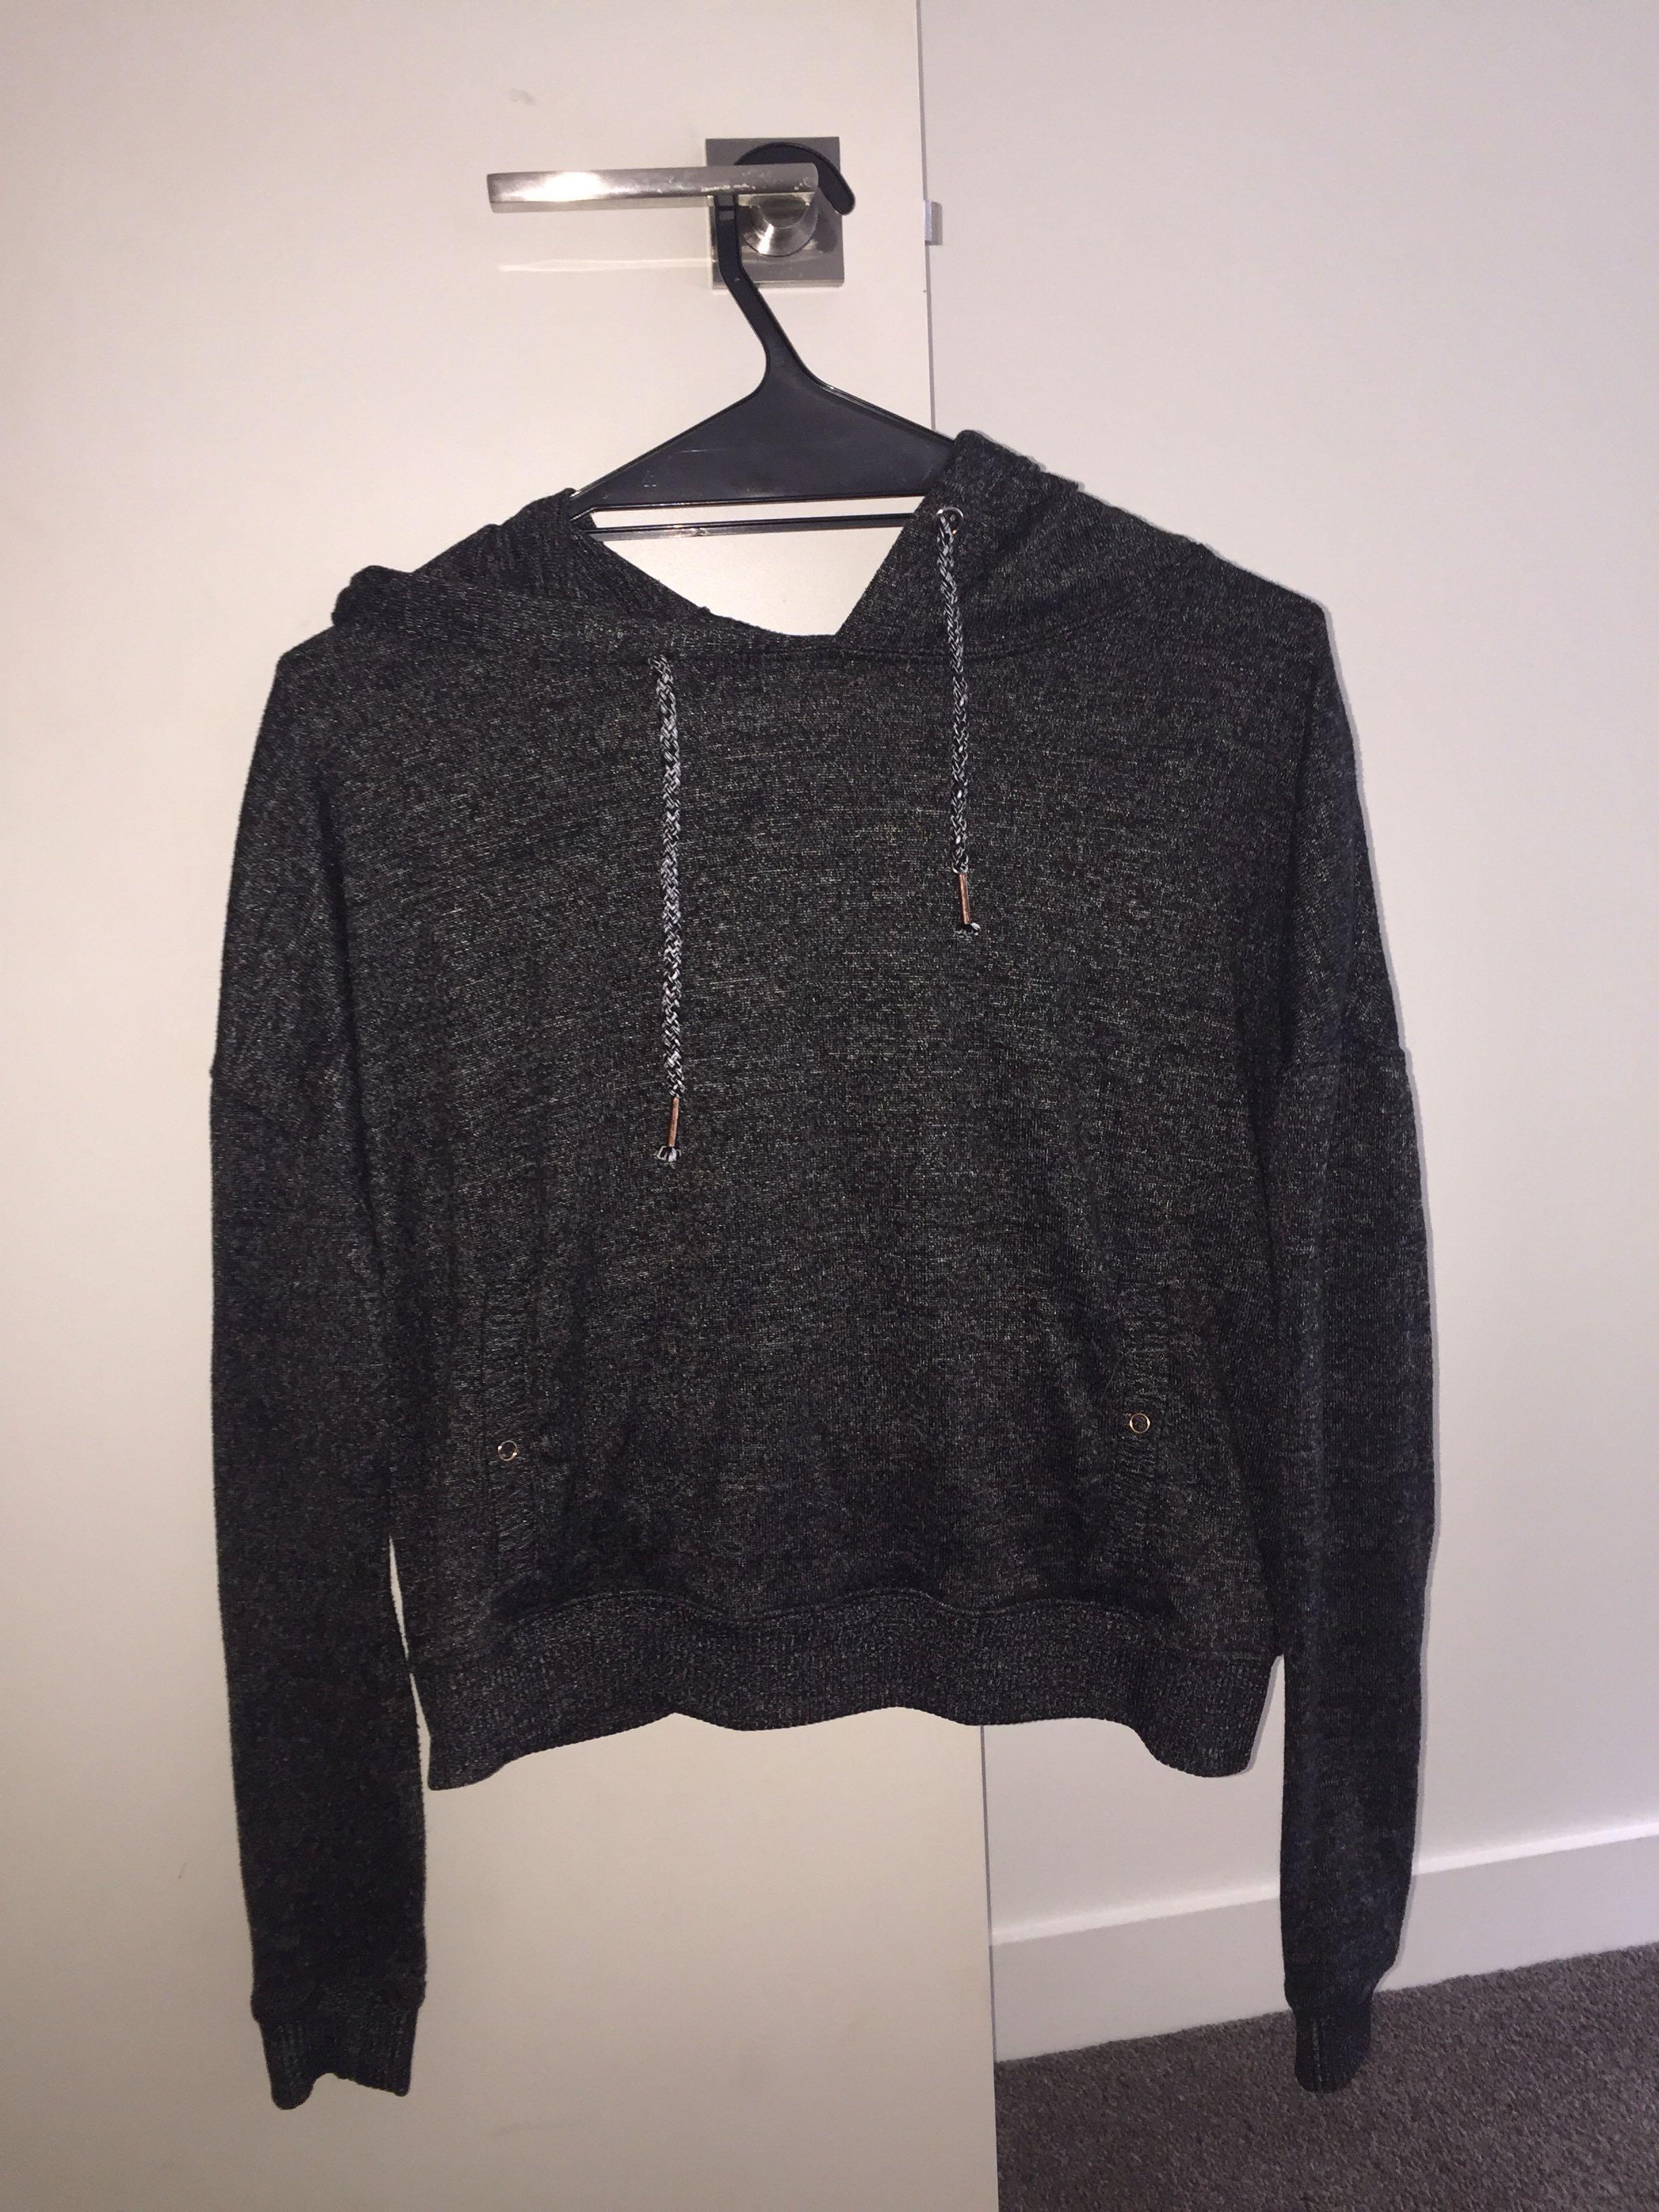 Cotton on cross-back hoodie